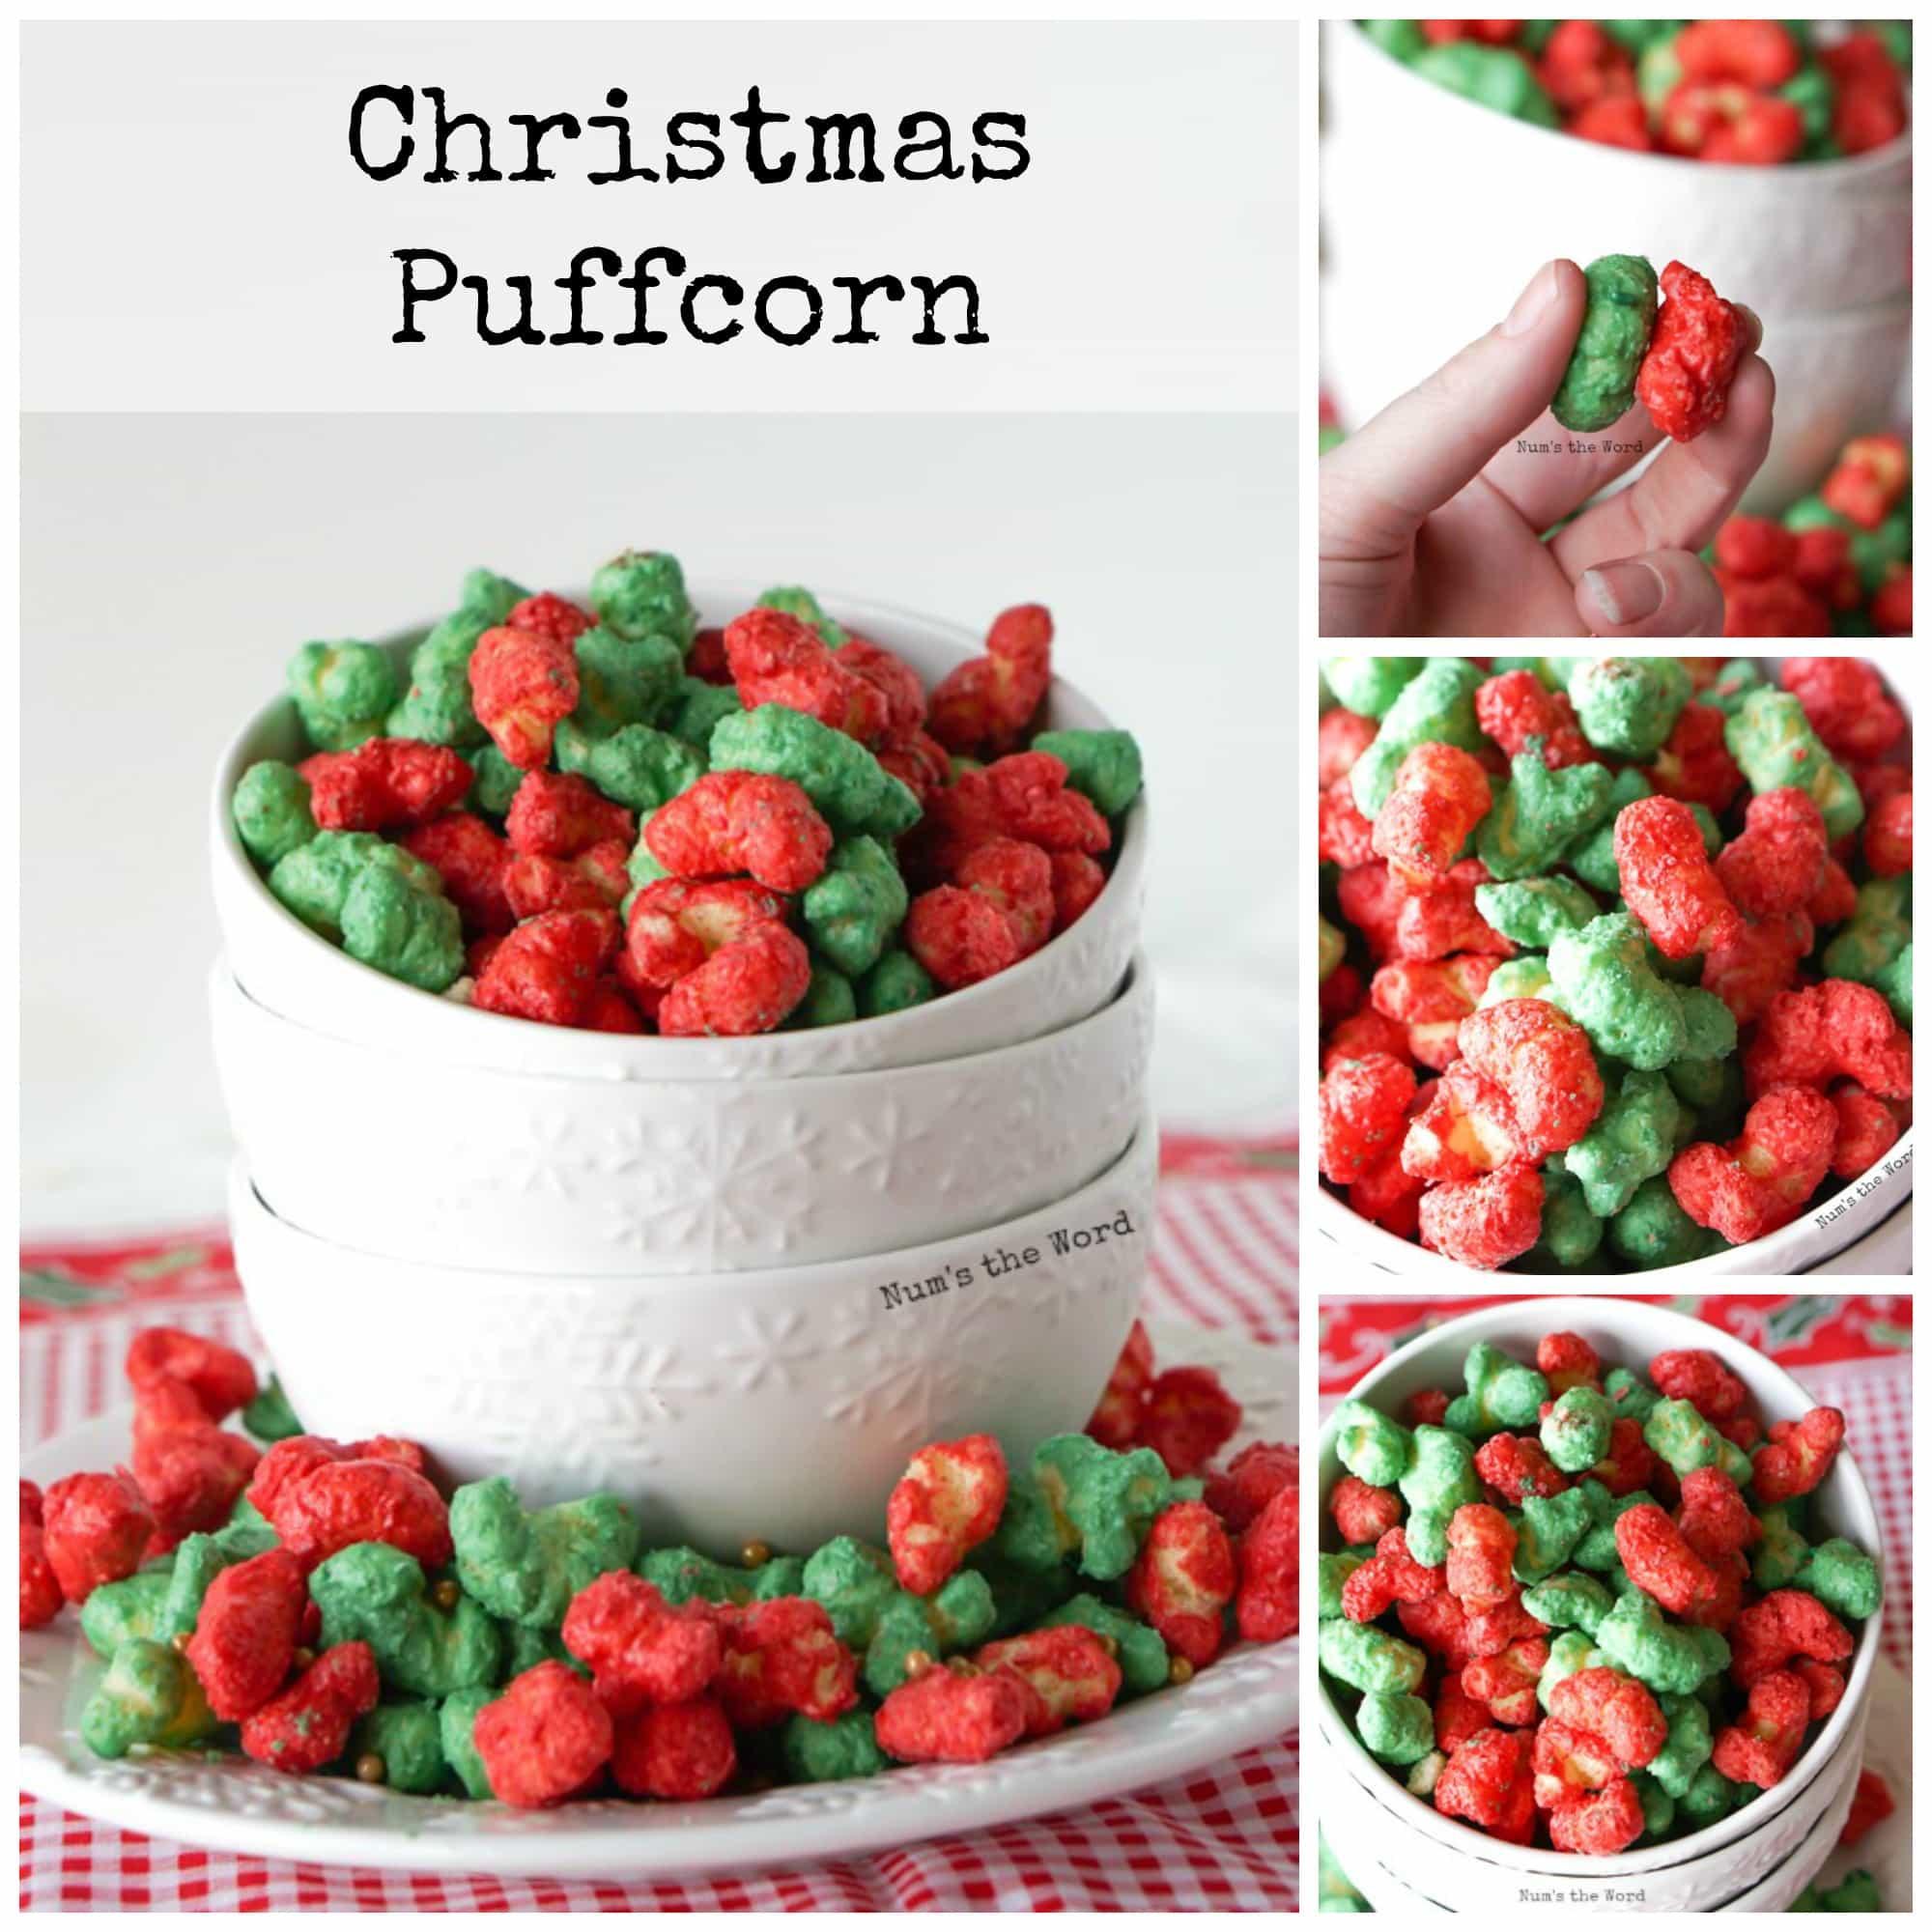 Christmas Puffcorn -